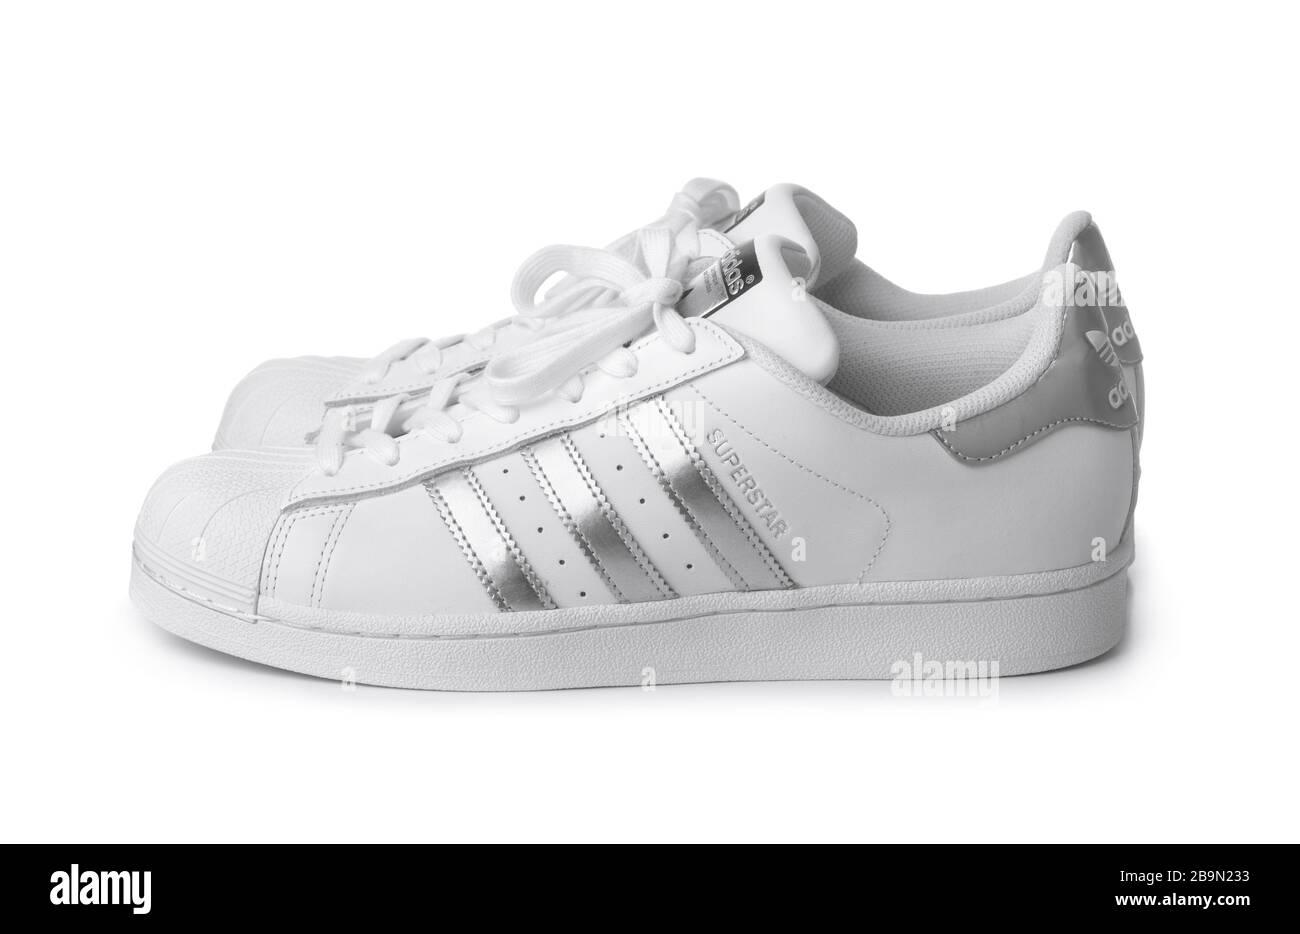 zapatos blancos adidas